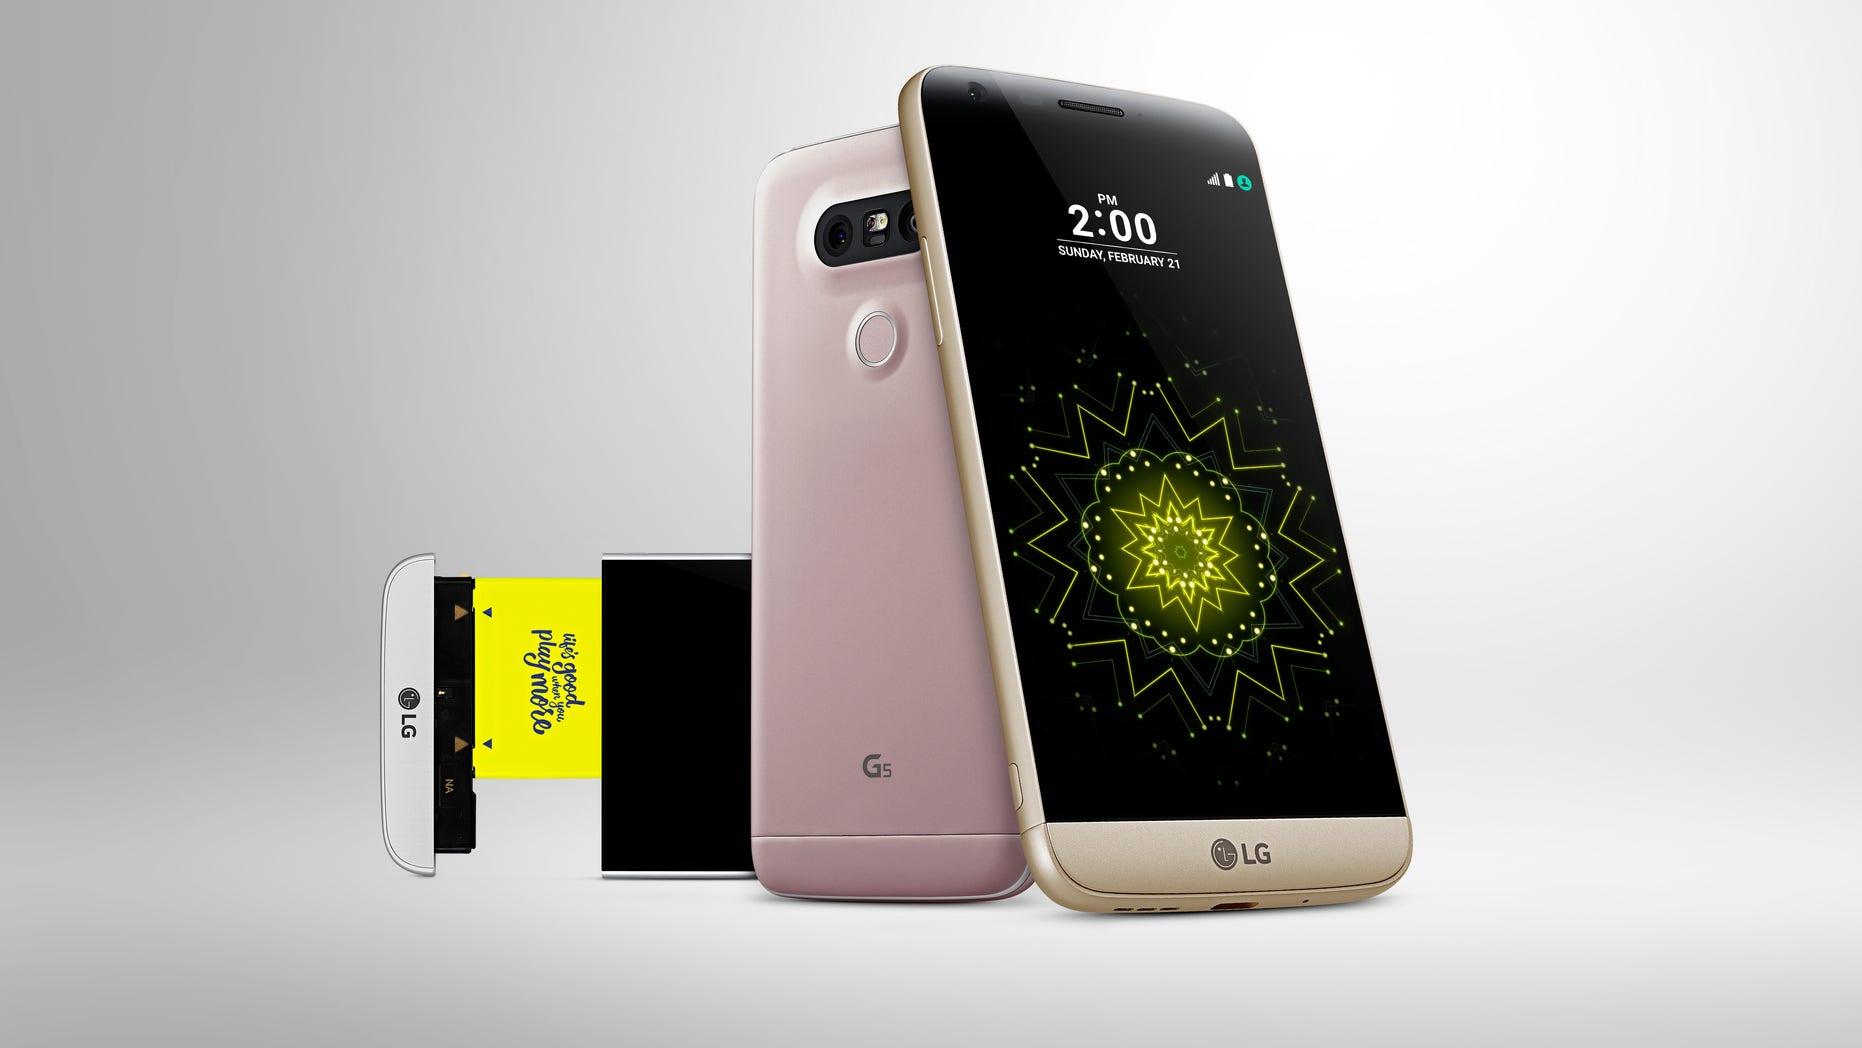 LG G5 (LG)